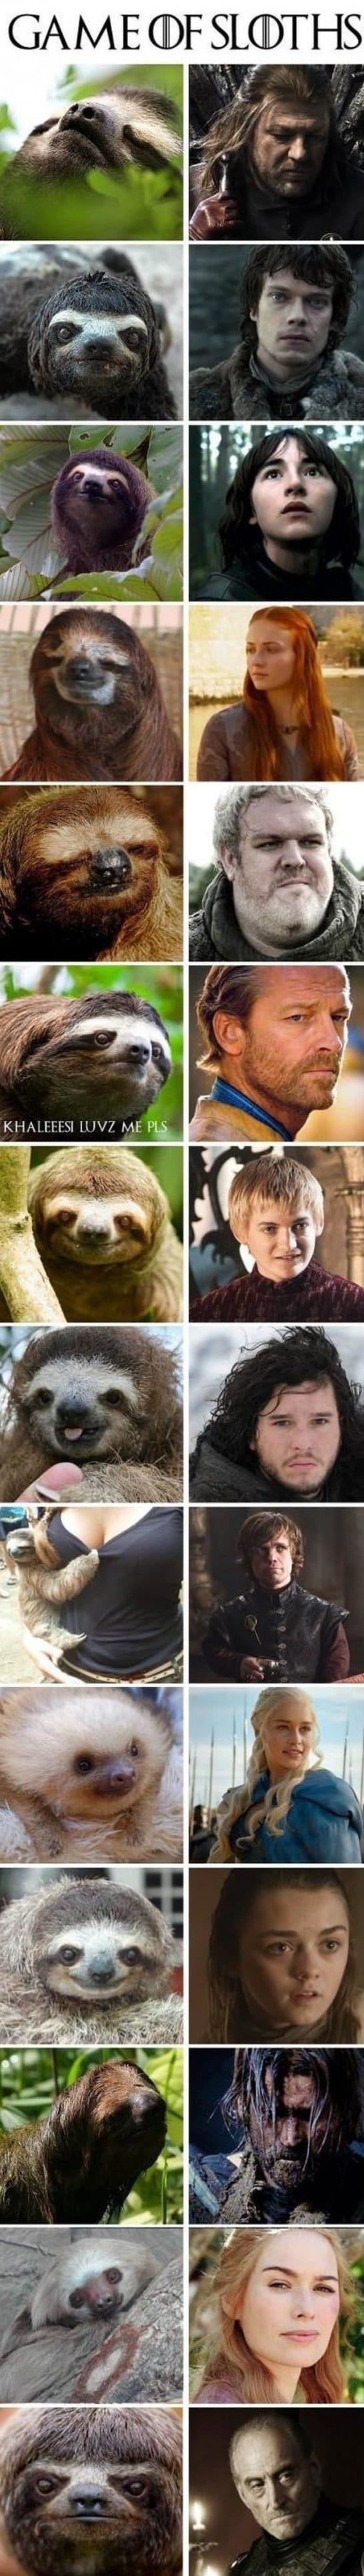 jokes-2014-game-of-sloths